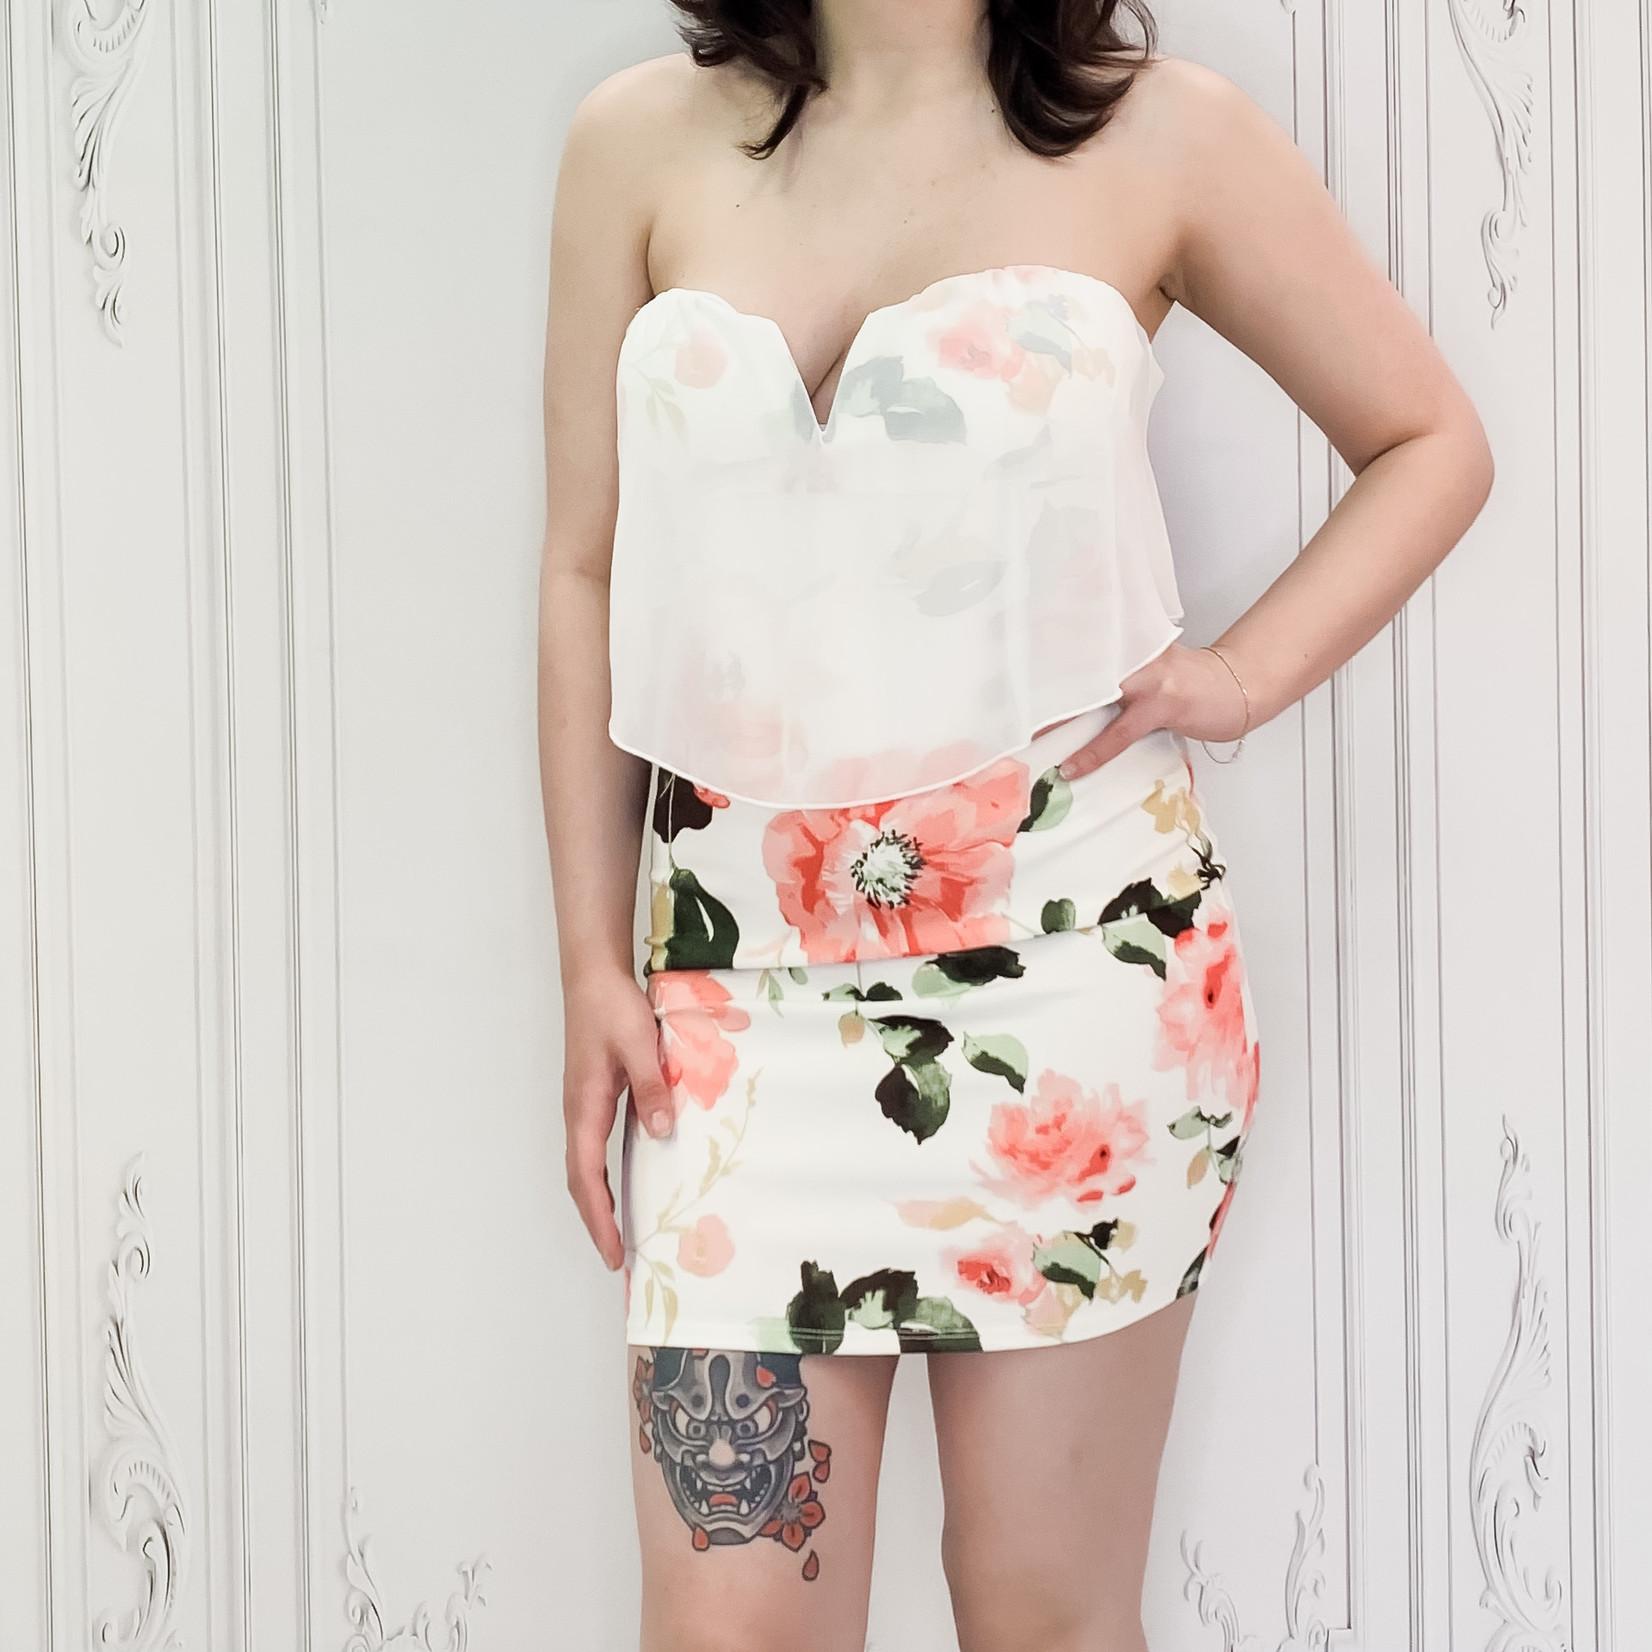 Jesse floral strapless chiffon layer dress